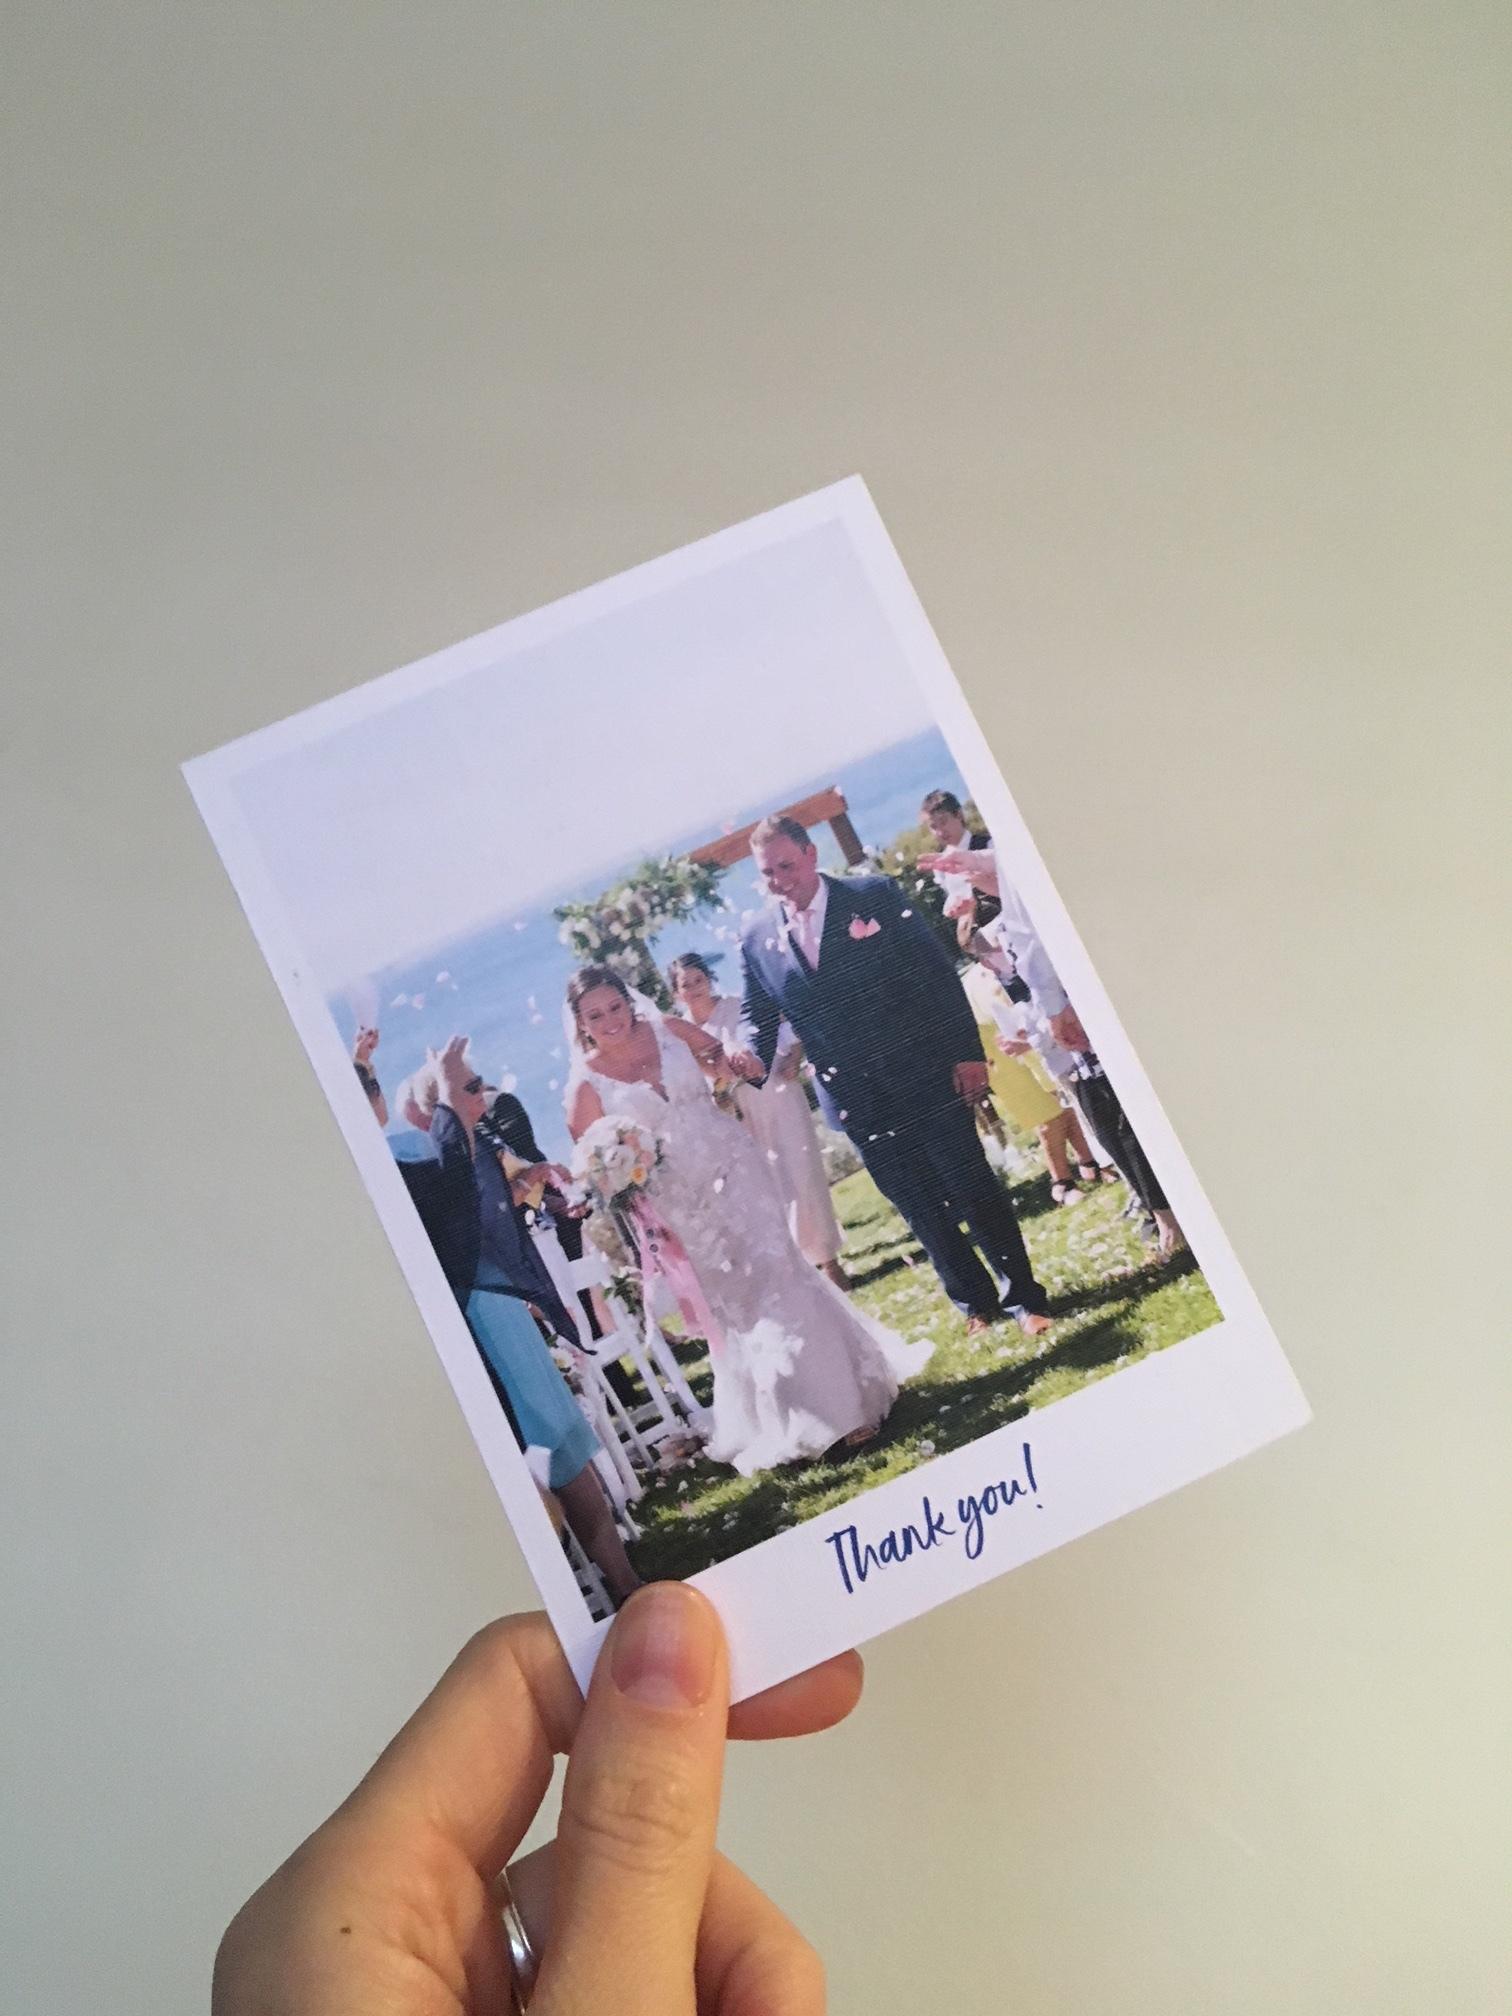 THANKYOU-CARDS-023.JPG